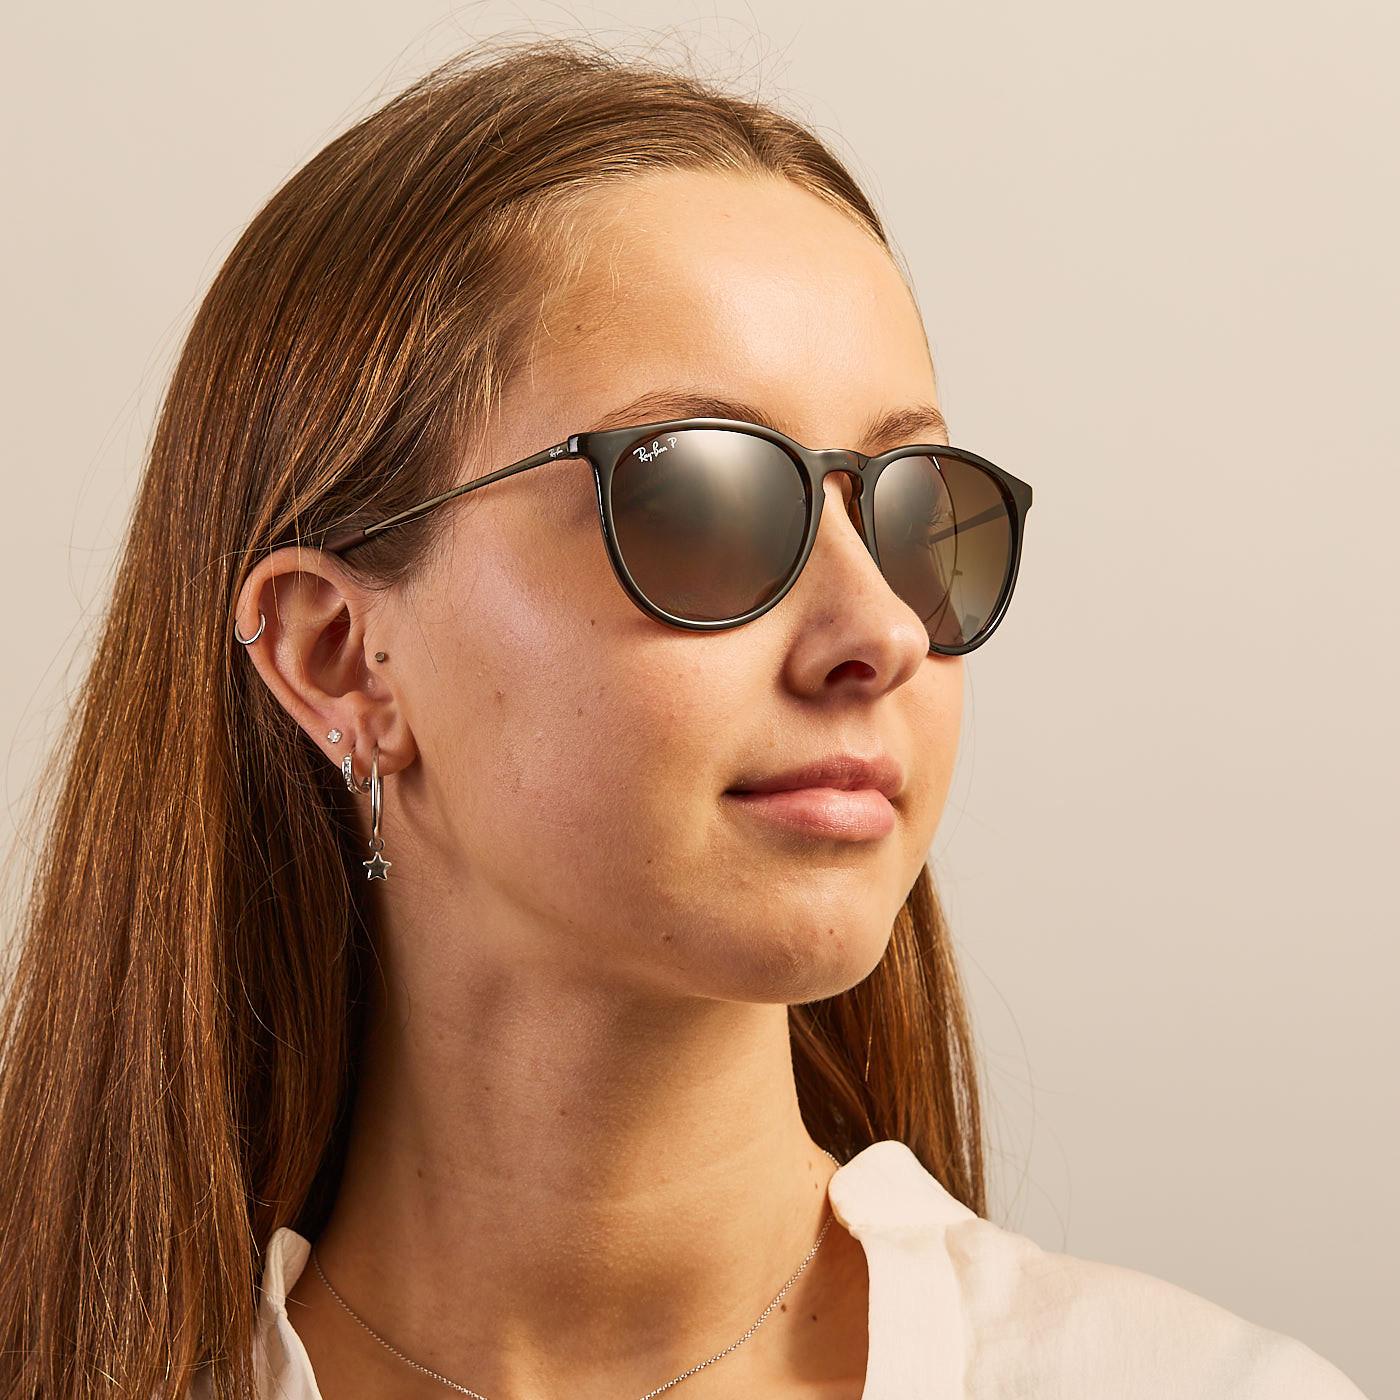 c701da81c2af9a Ray-Ban Erika Havana Polarized Sunglasses RB4171 710/T5 - Sunglasses